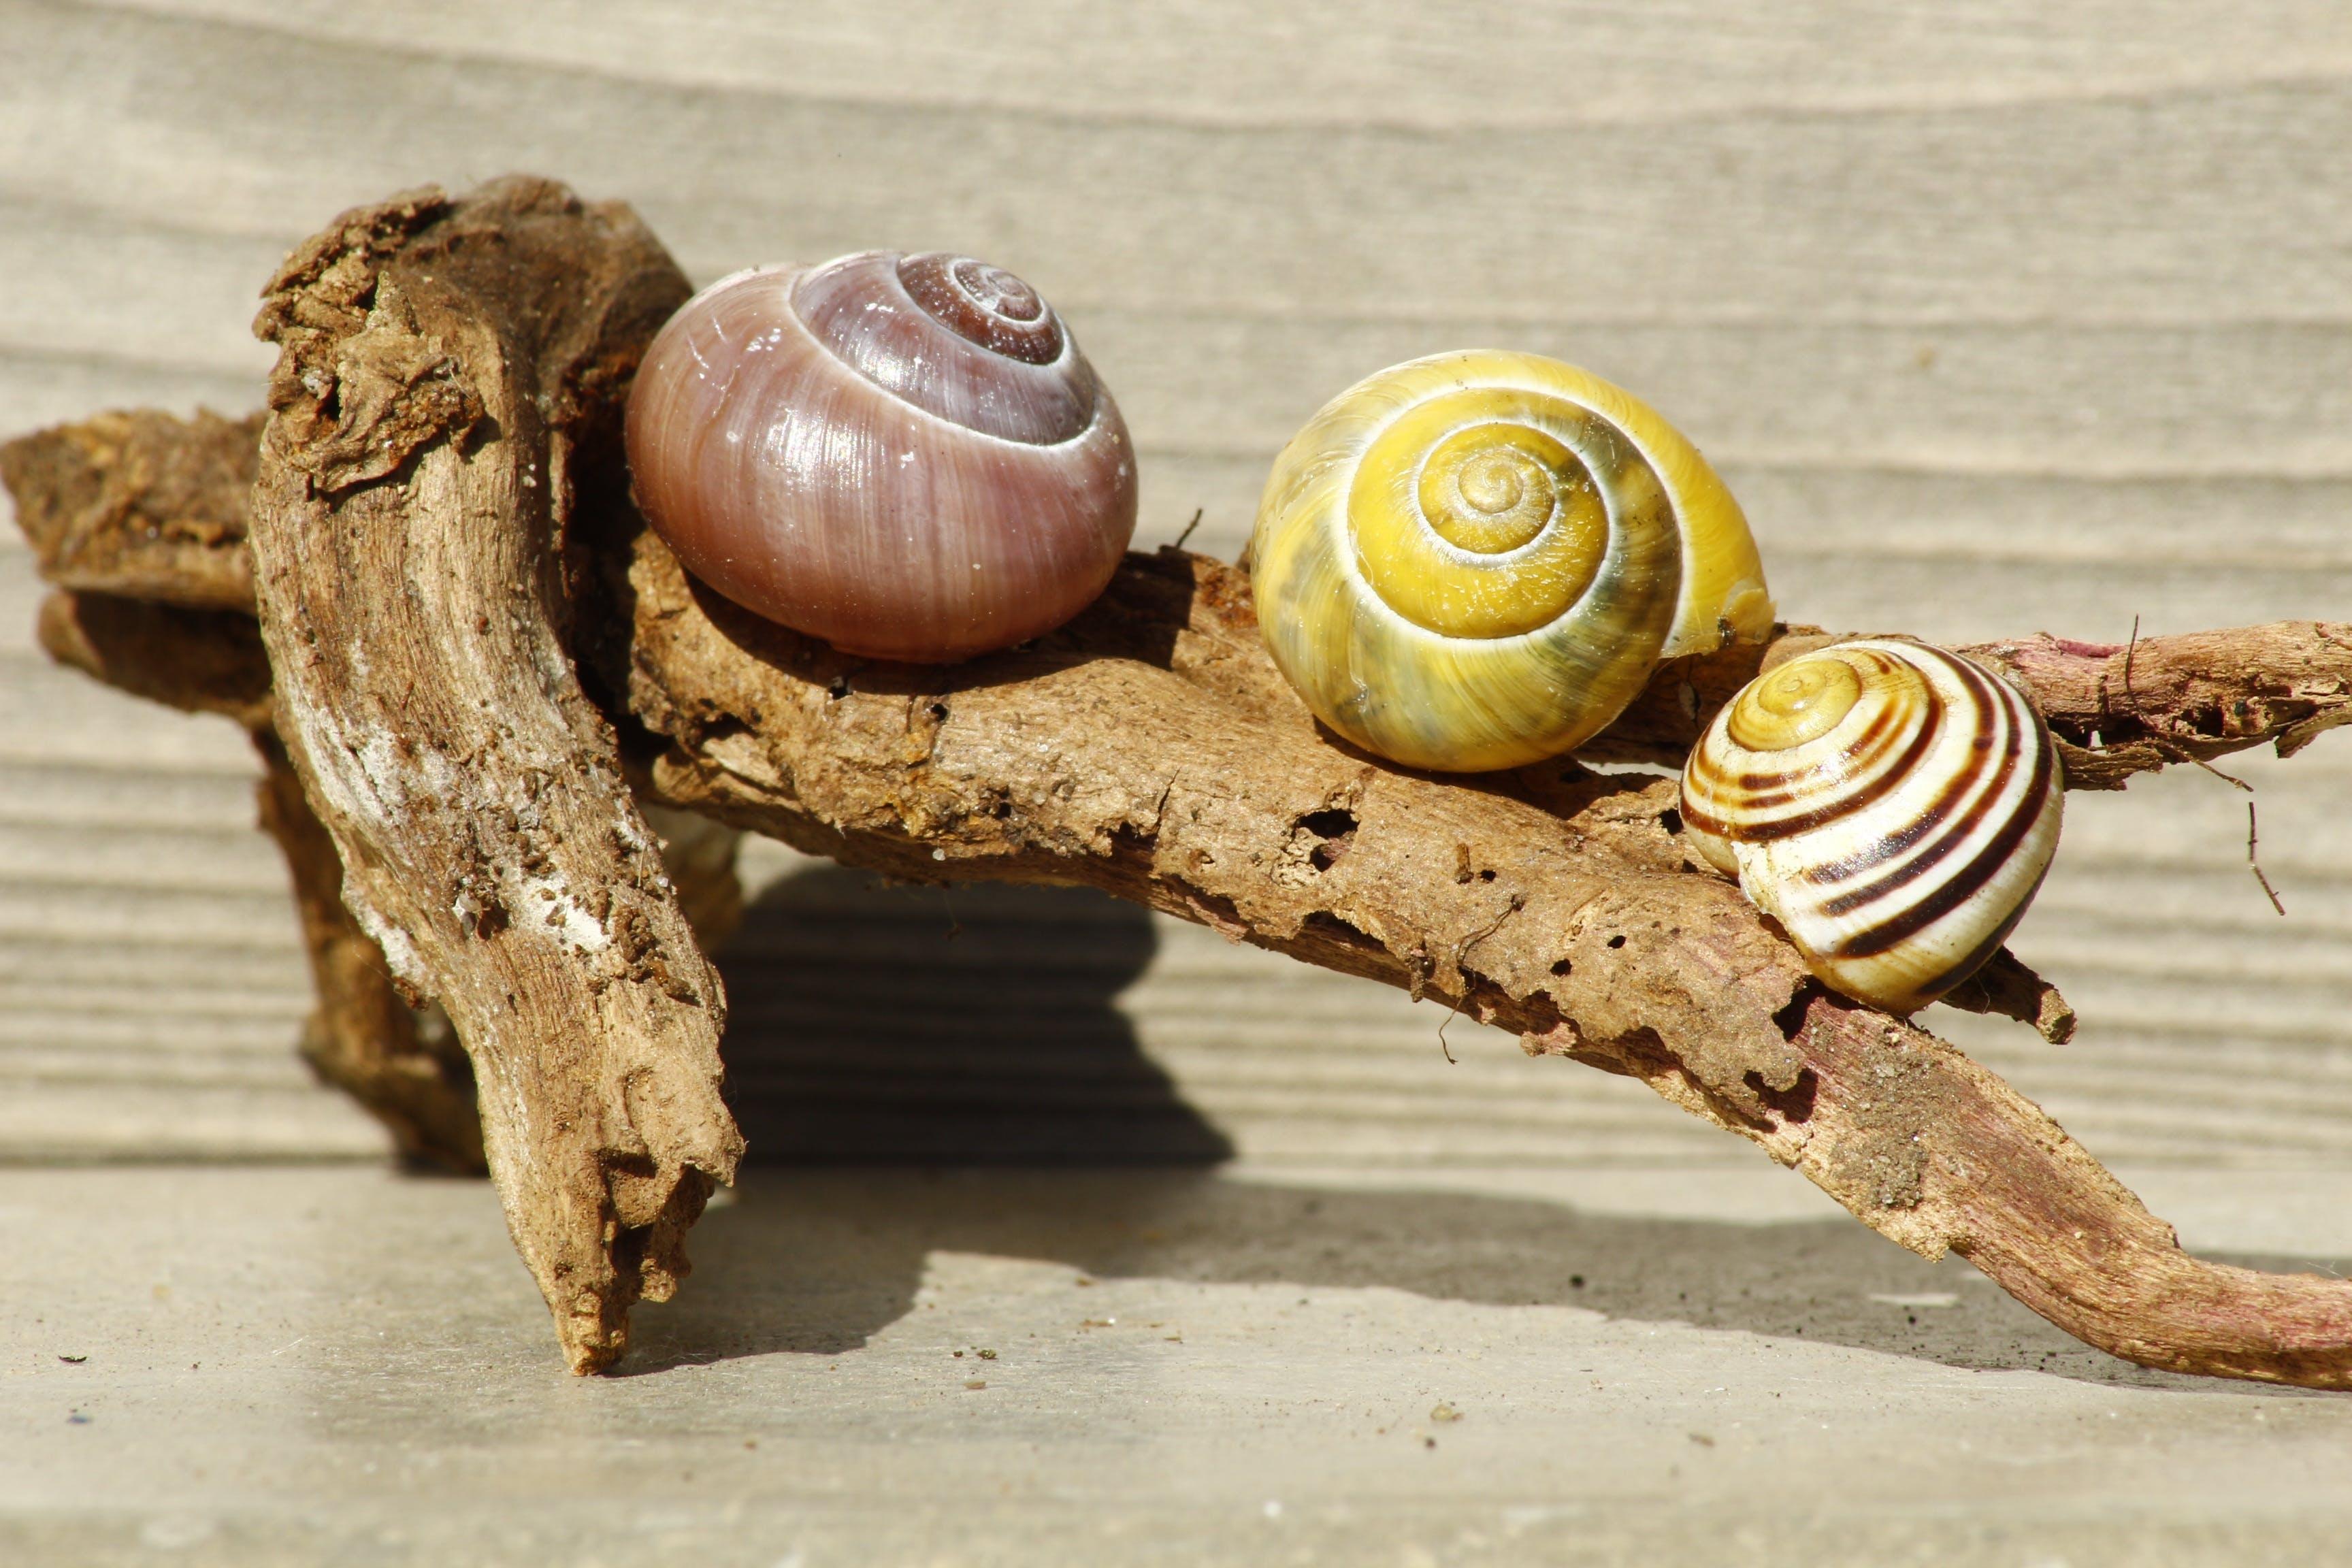 Free stock photo of wood, nature, animals, shell